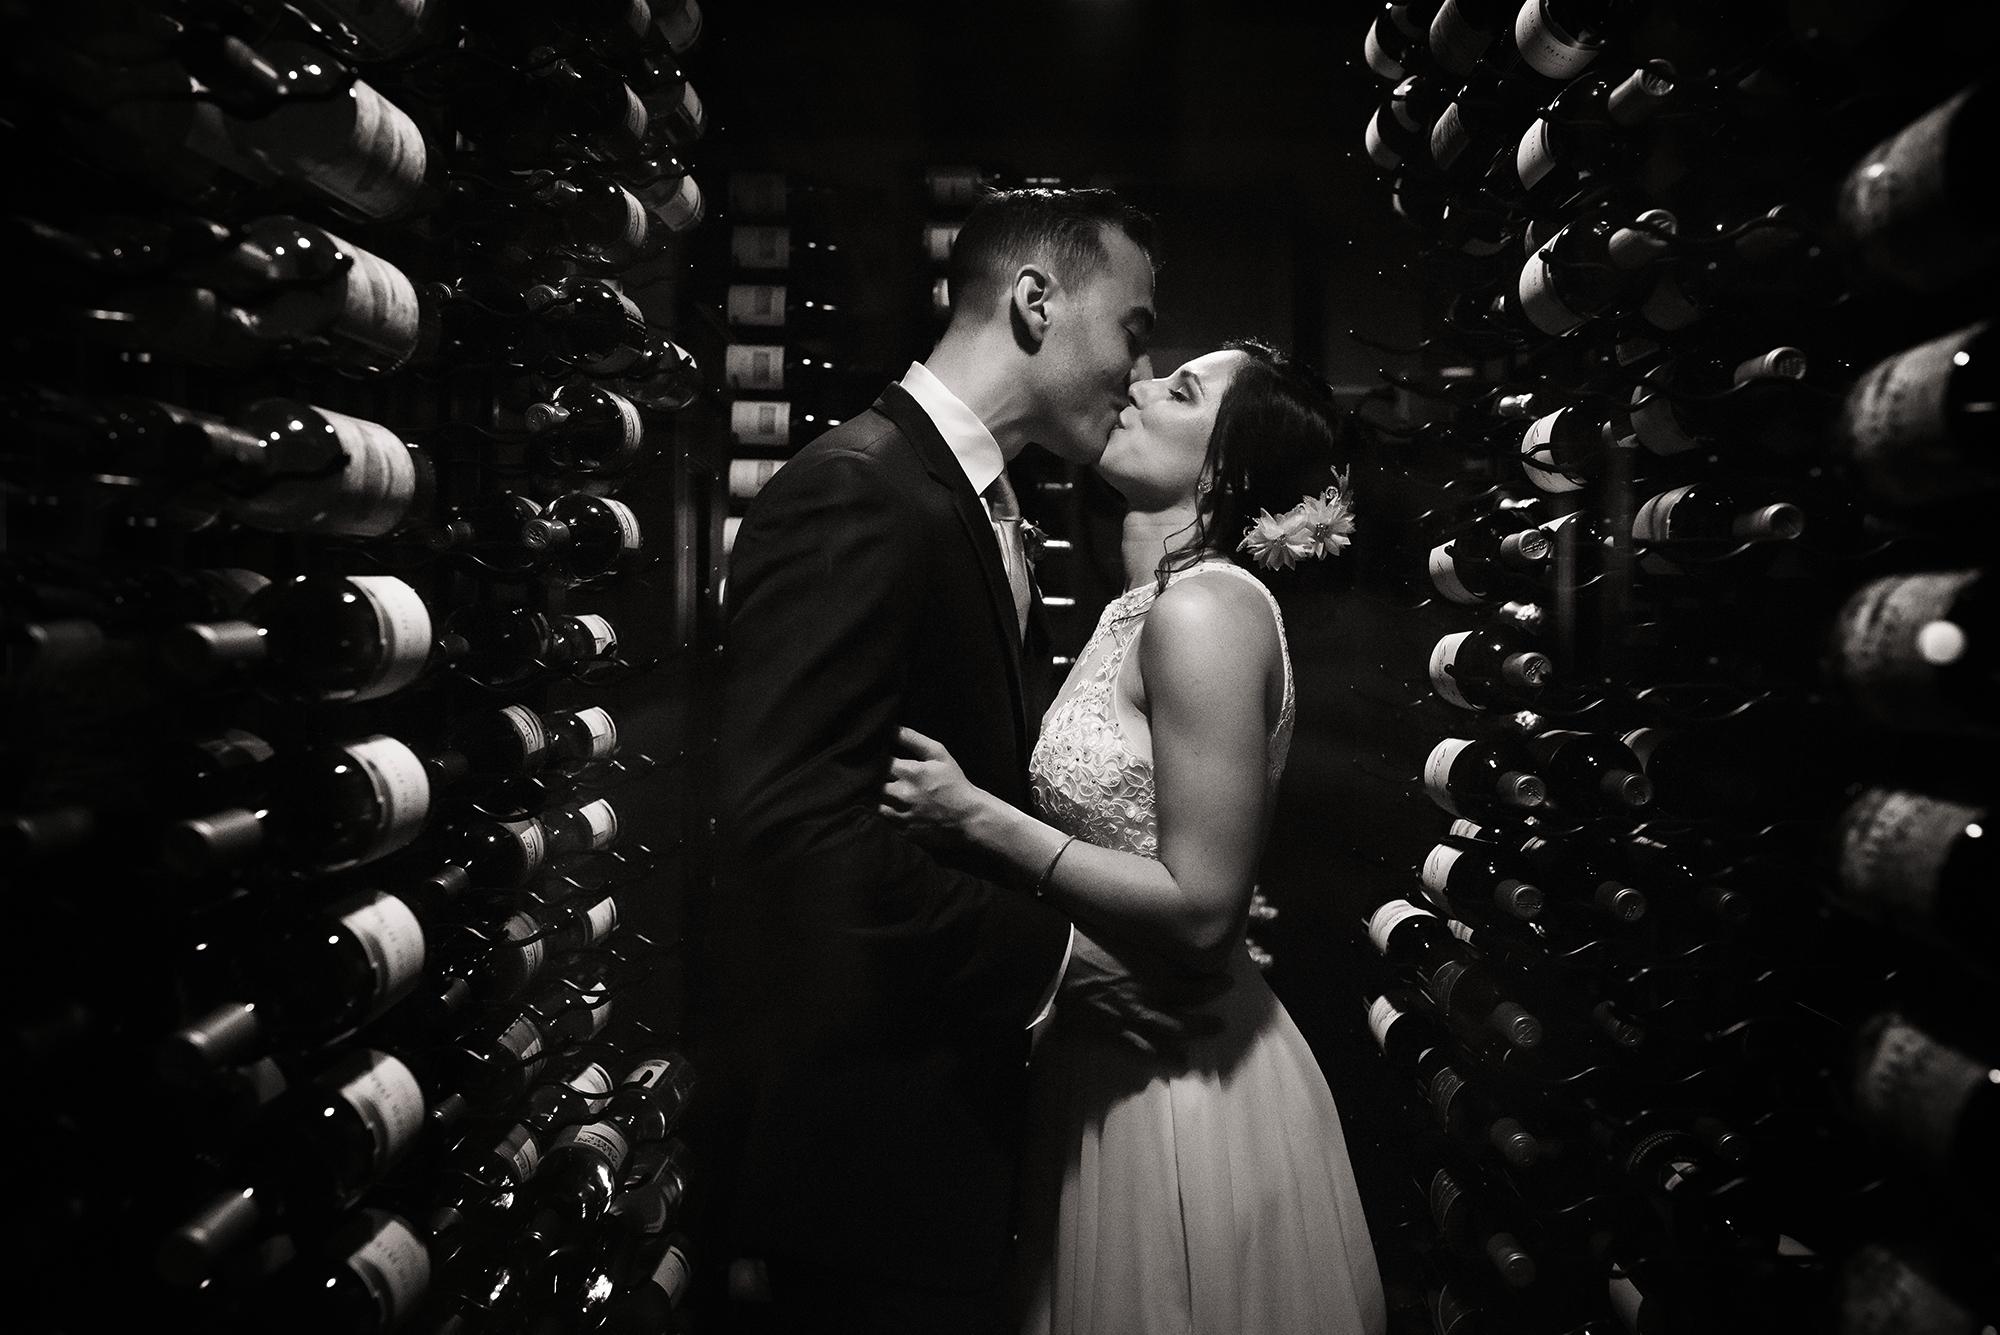 trenos-wedding-lbi-photographer-44.jpg